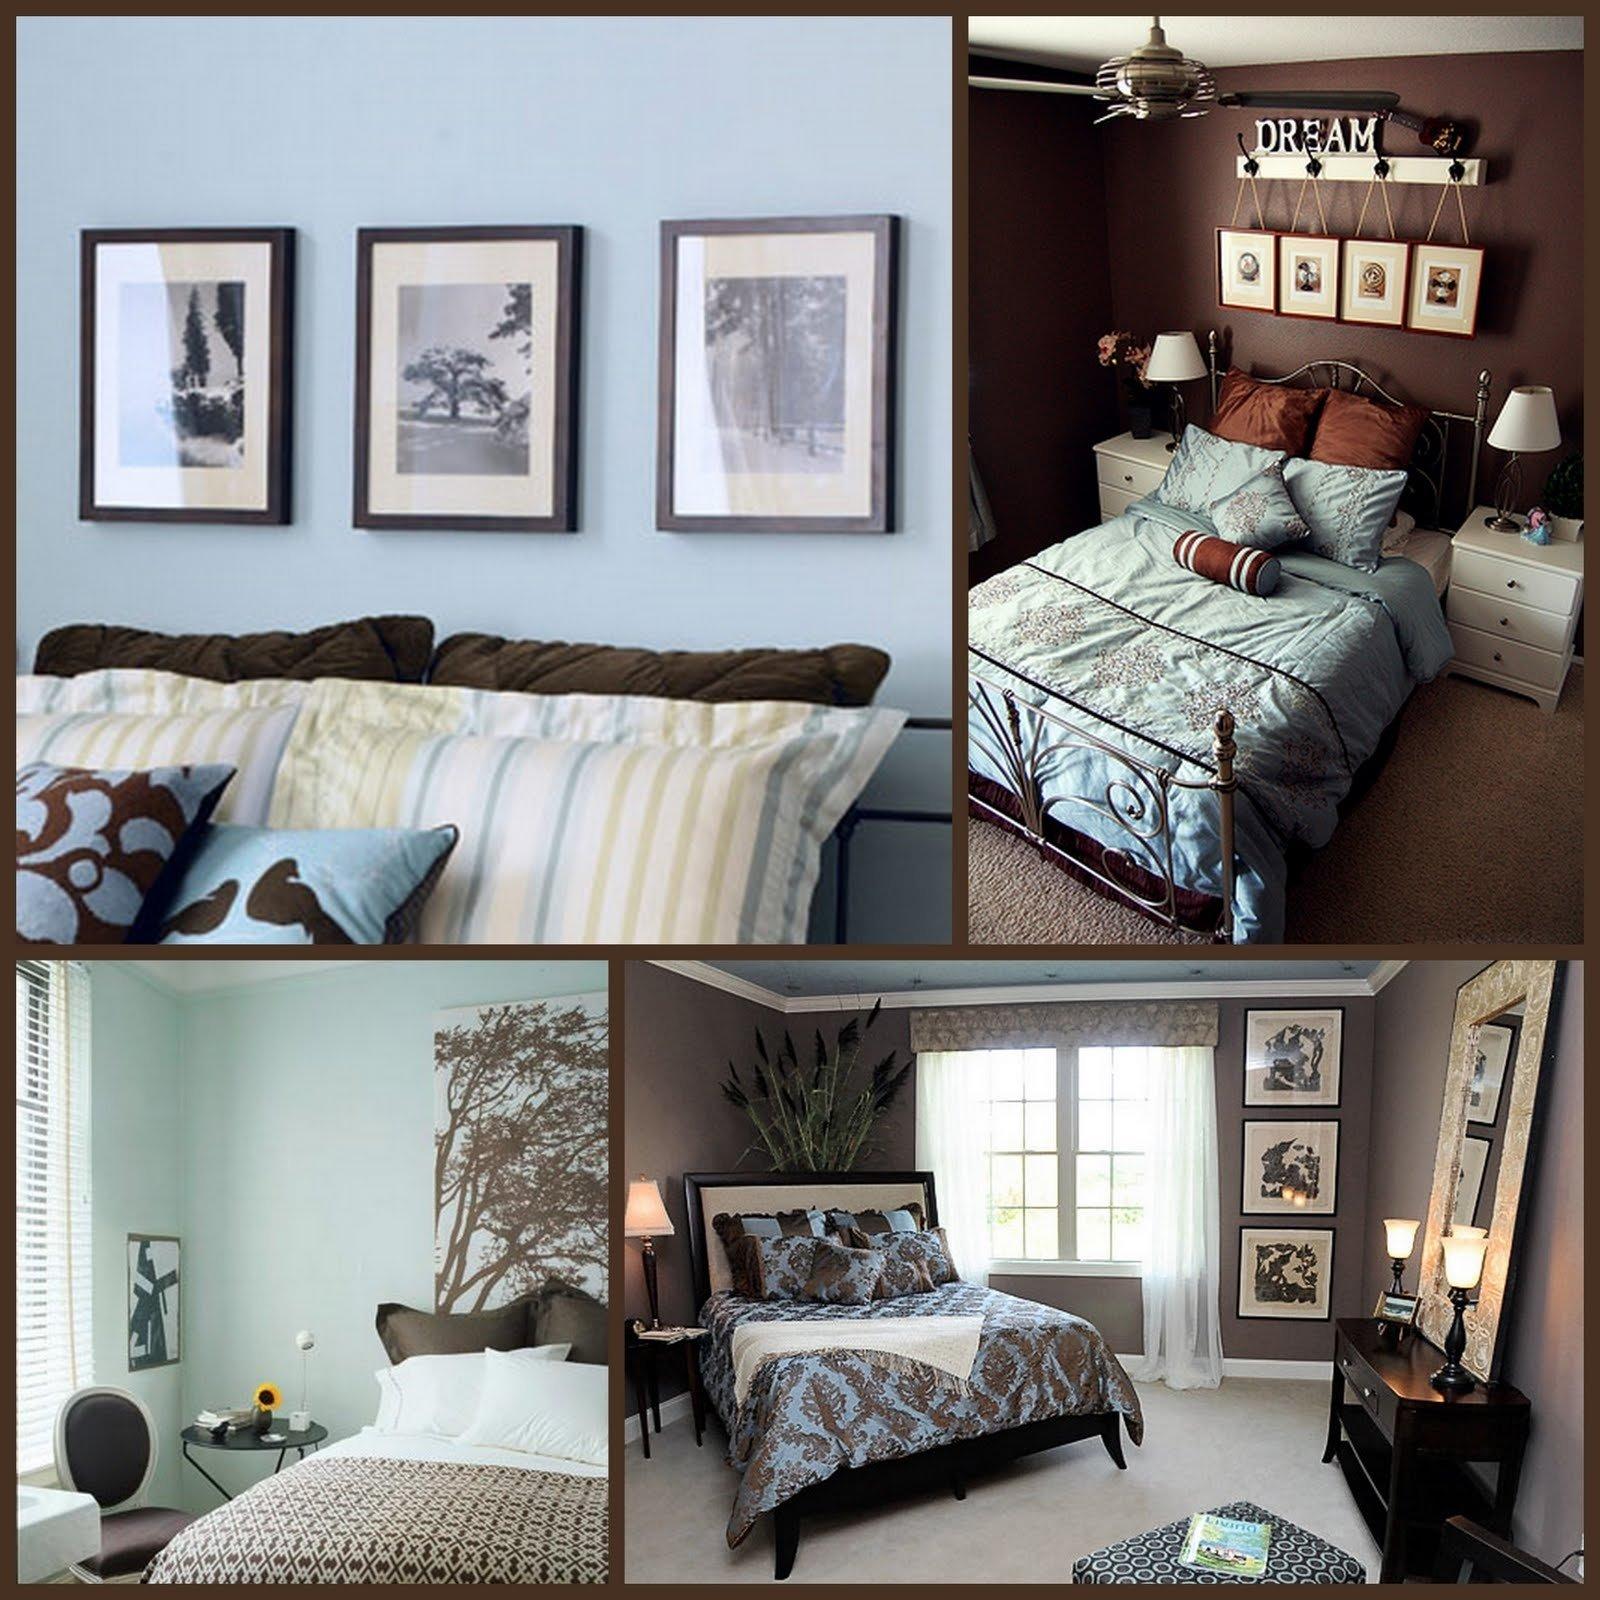 10 Fantastic Brown And Blue Bedroom Ideas brown and blue bedroom ideas nurani 2021